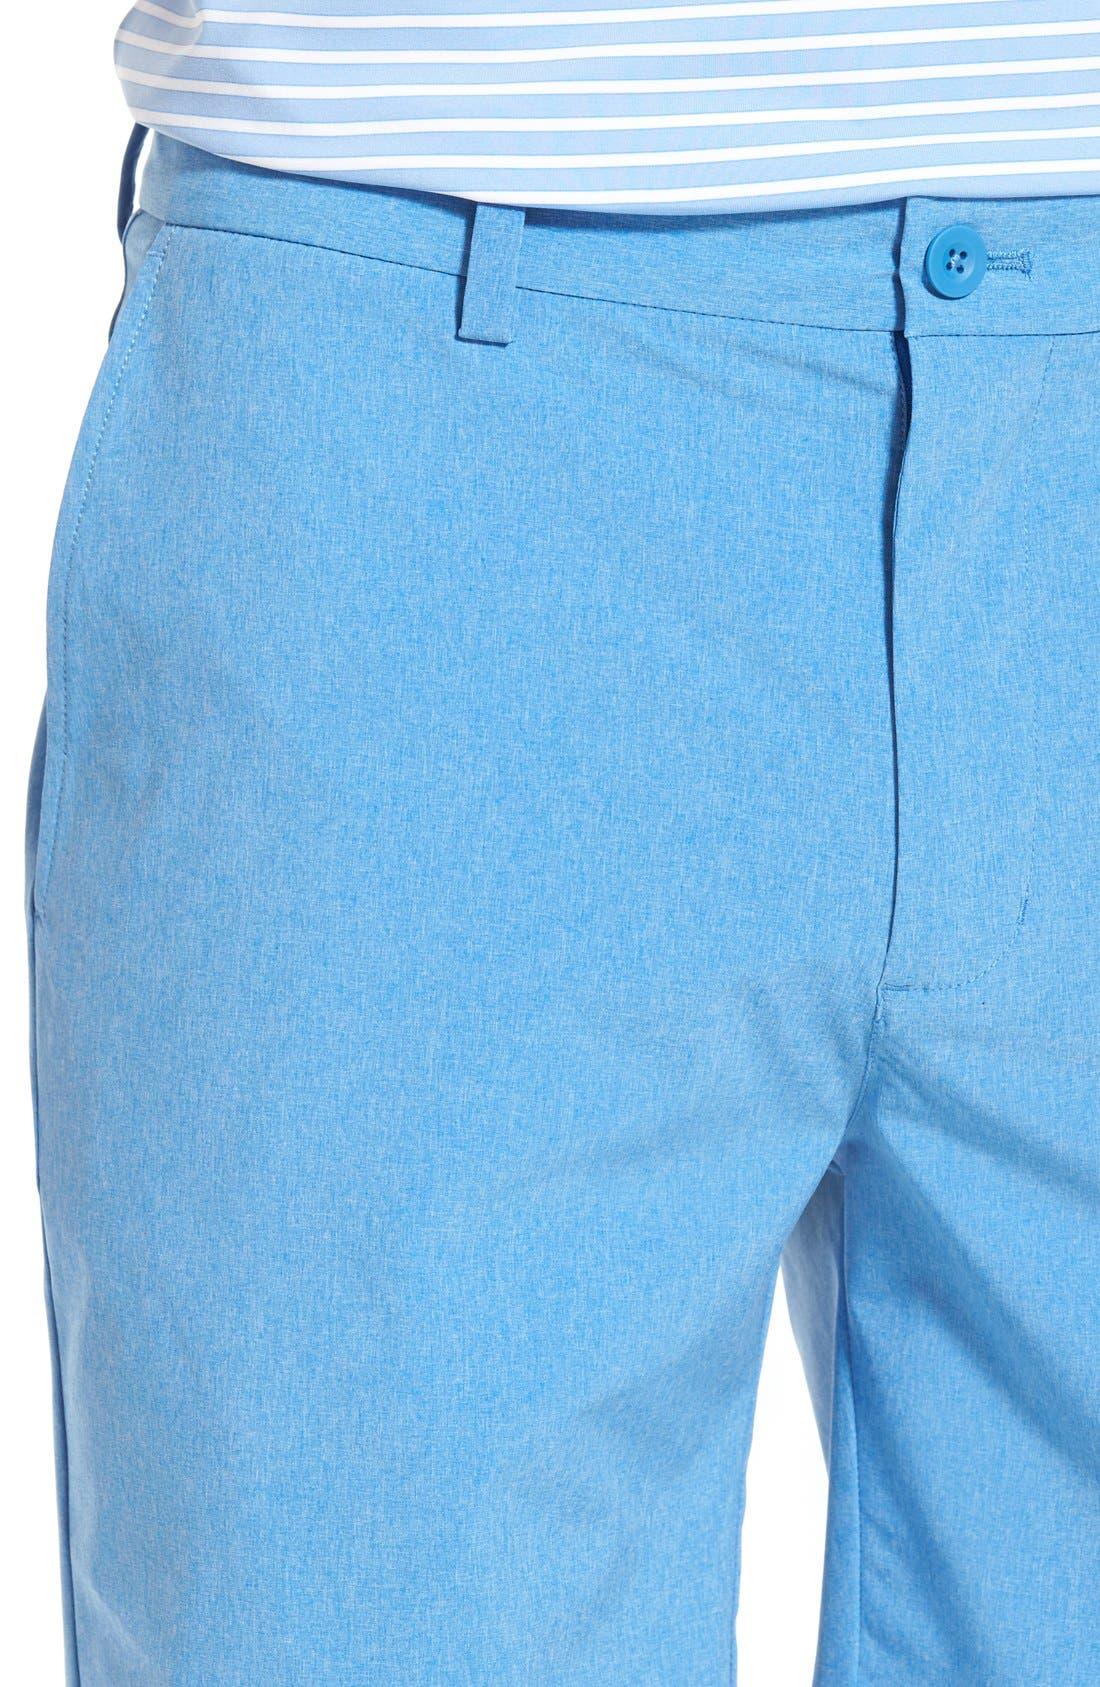 8 Inch Performance Breaker Shorts,                             Alternate thumbnail 37, color,